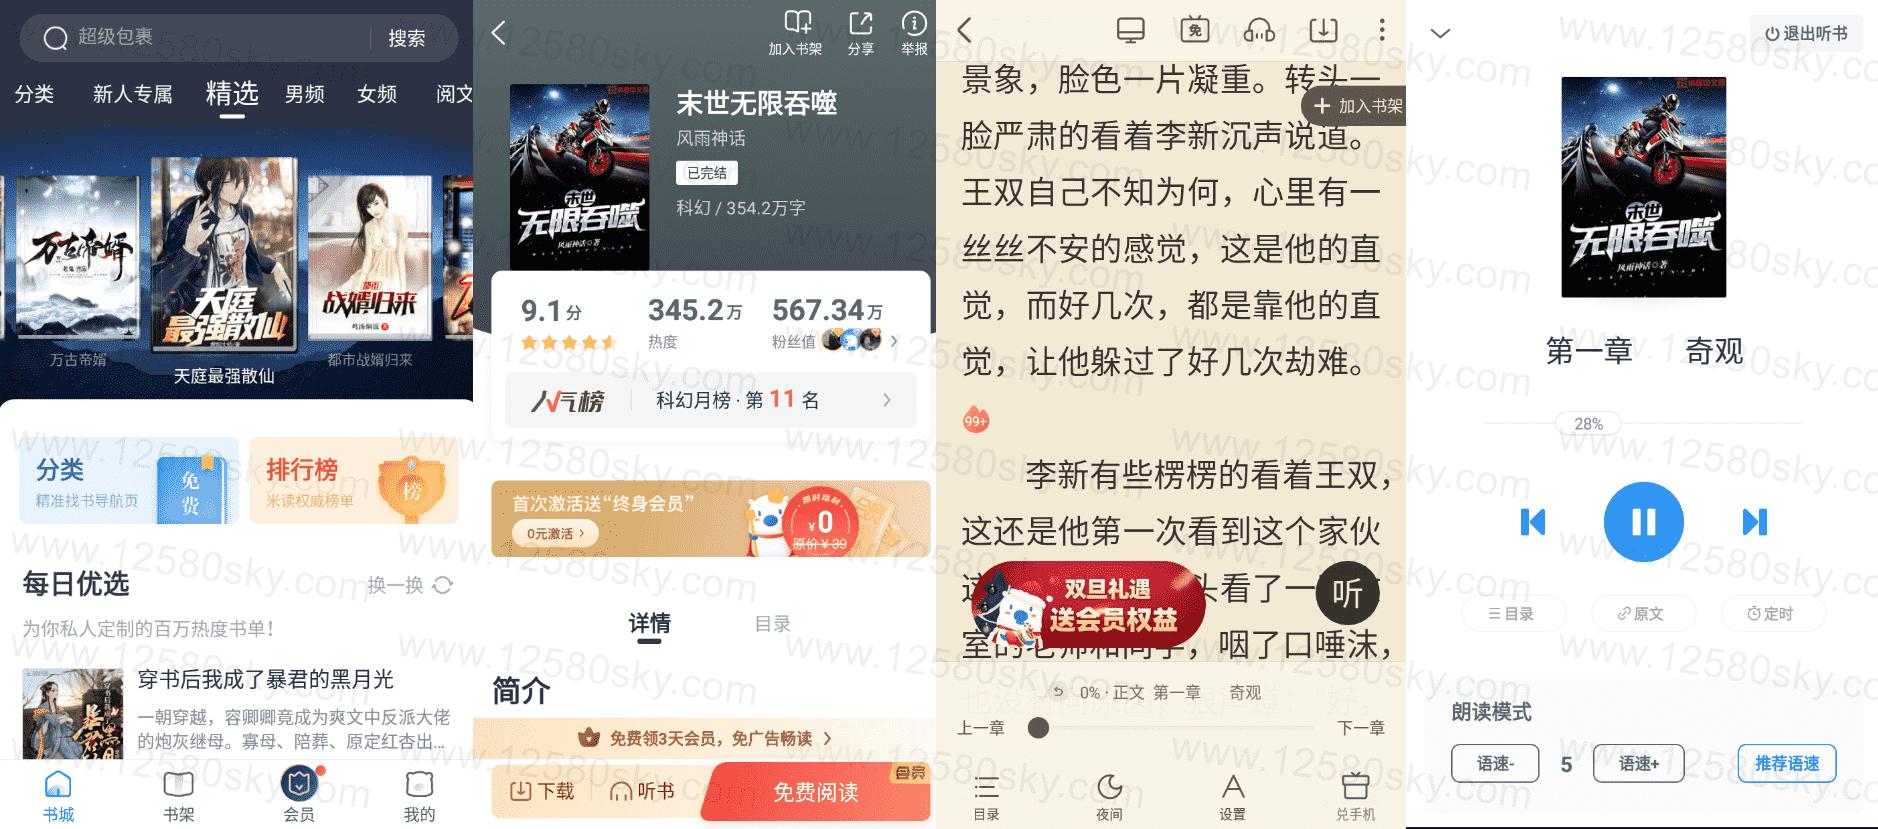 [Android]海量优质小说免费读:米读小说v5.41.0纯净专业版 支持听书 配图